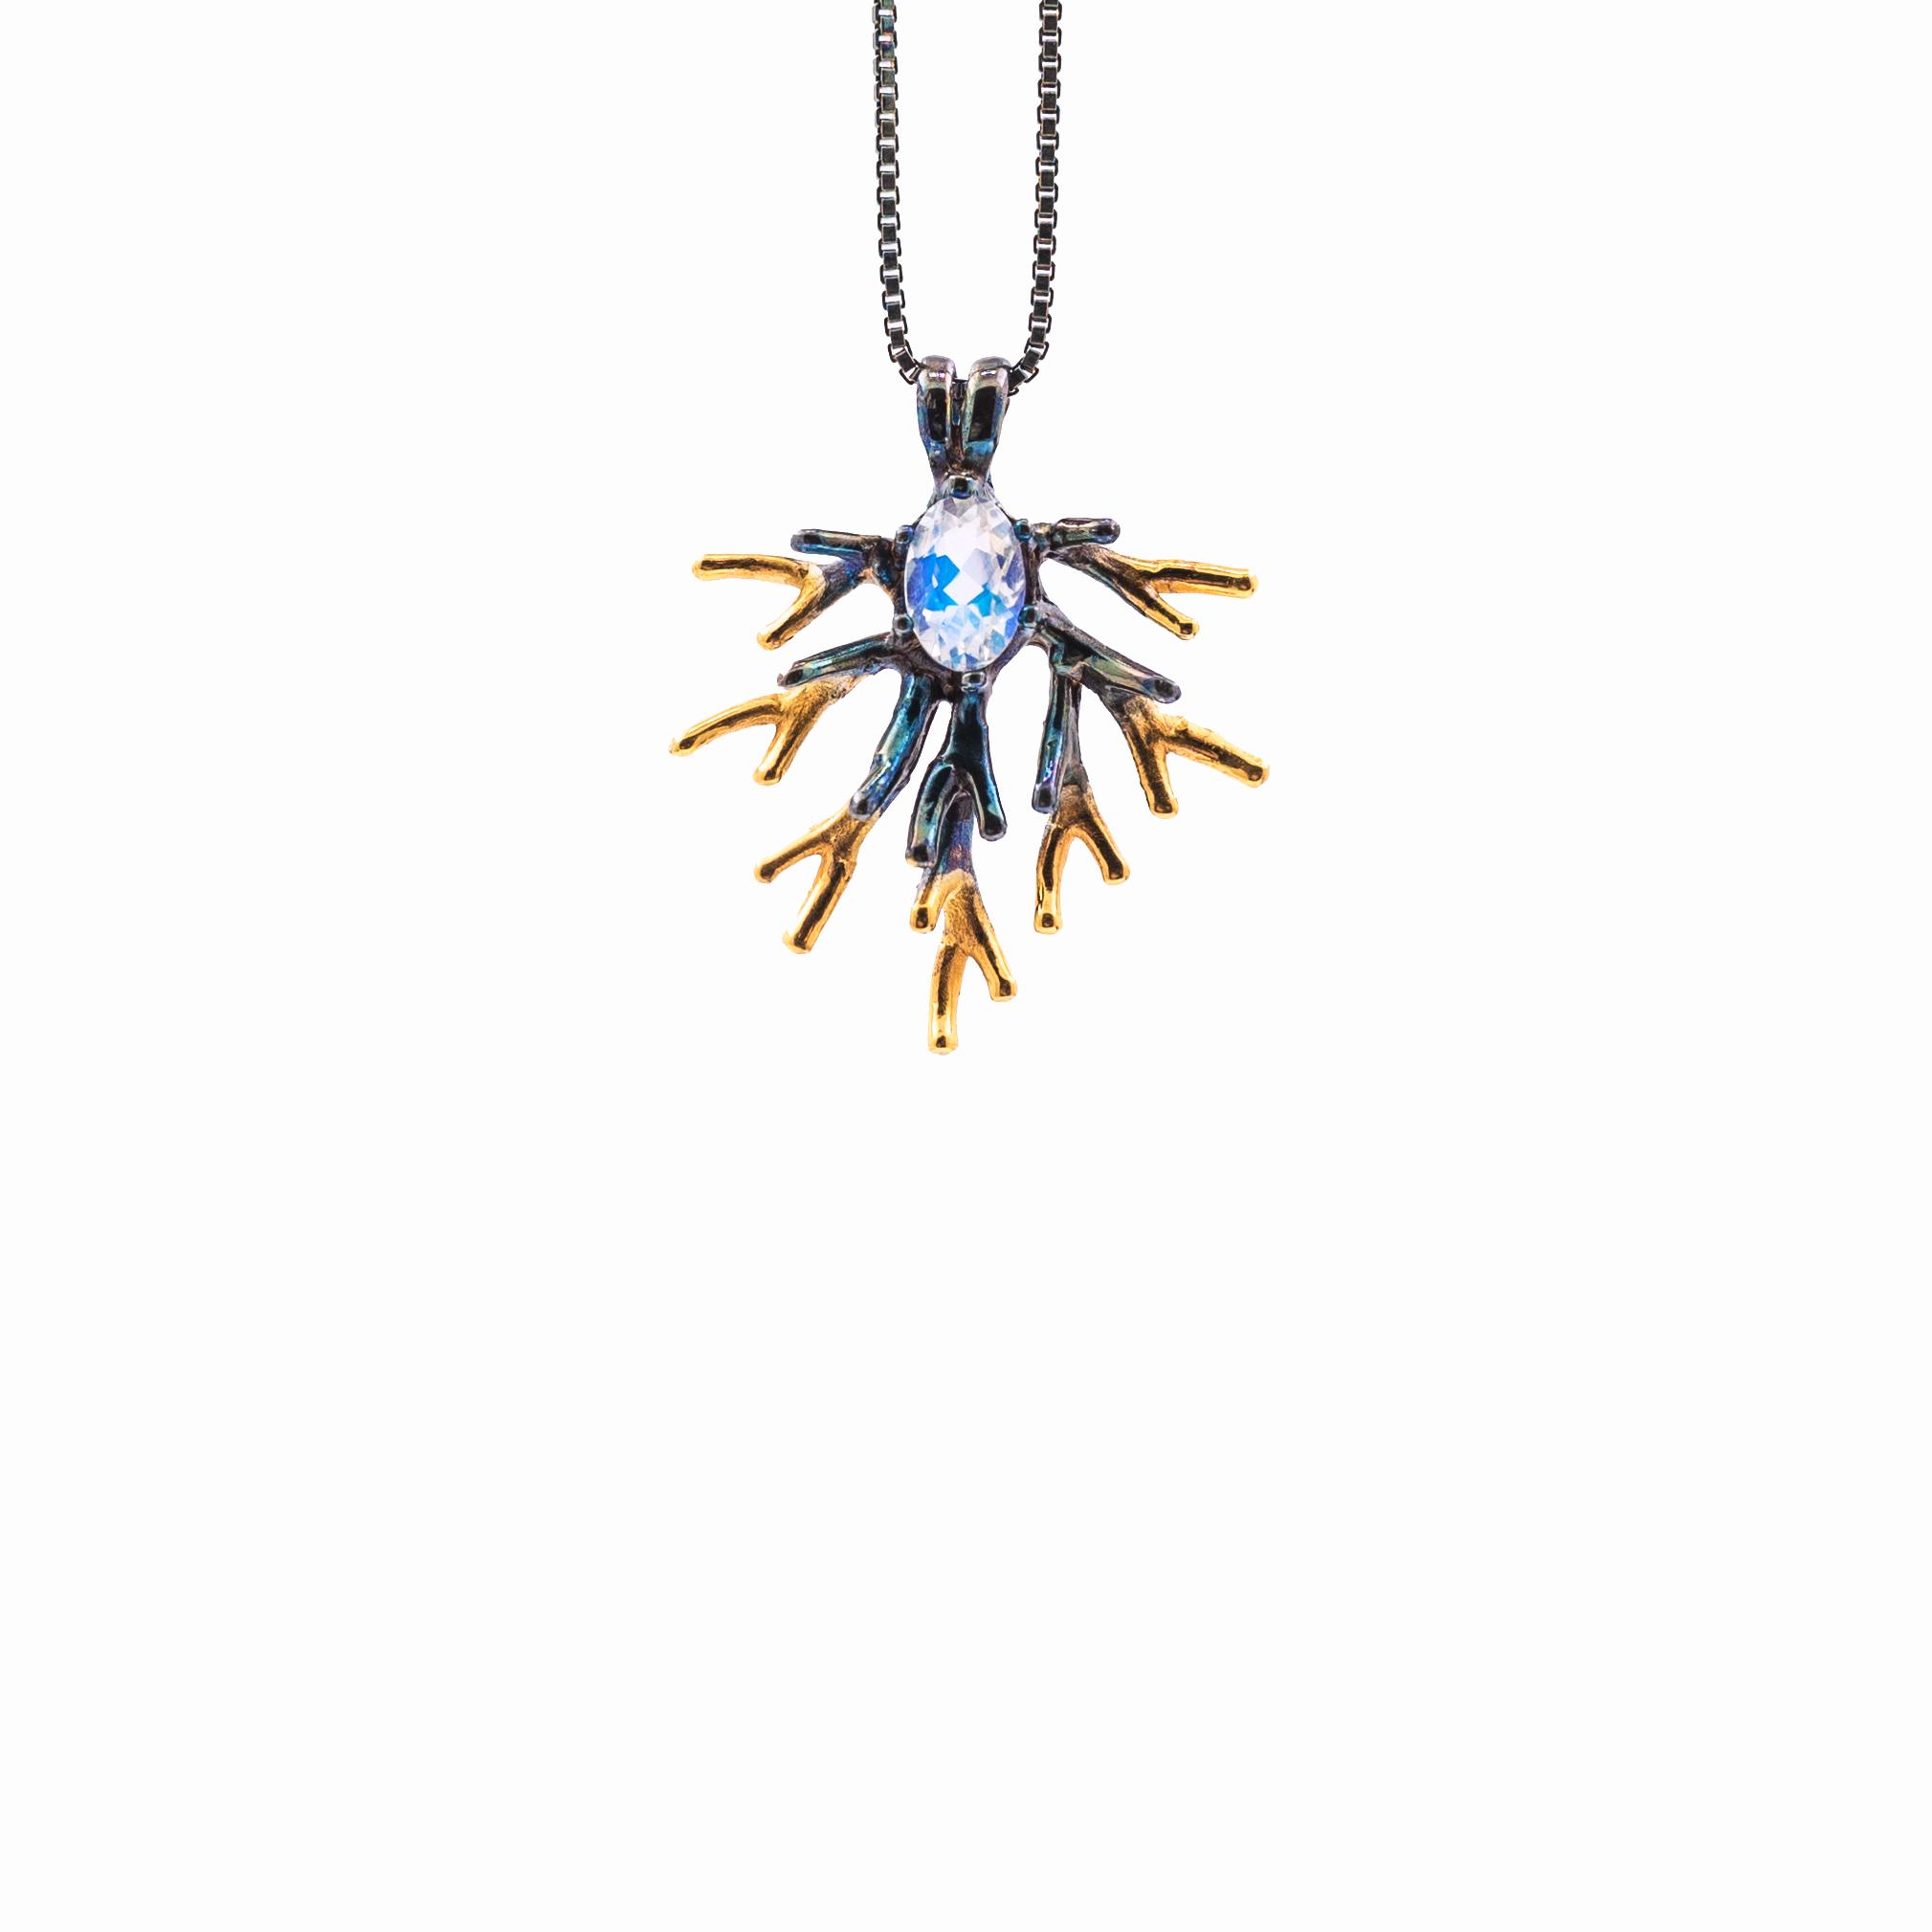 Unfolding Pendant | Sterling silver, moonstone, gold vermeil, patina.